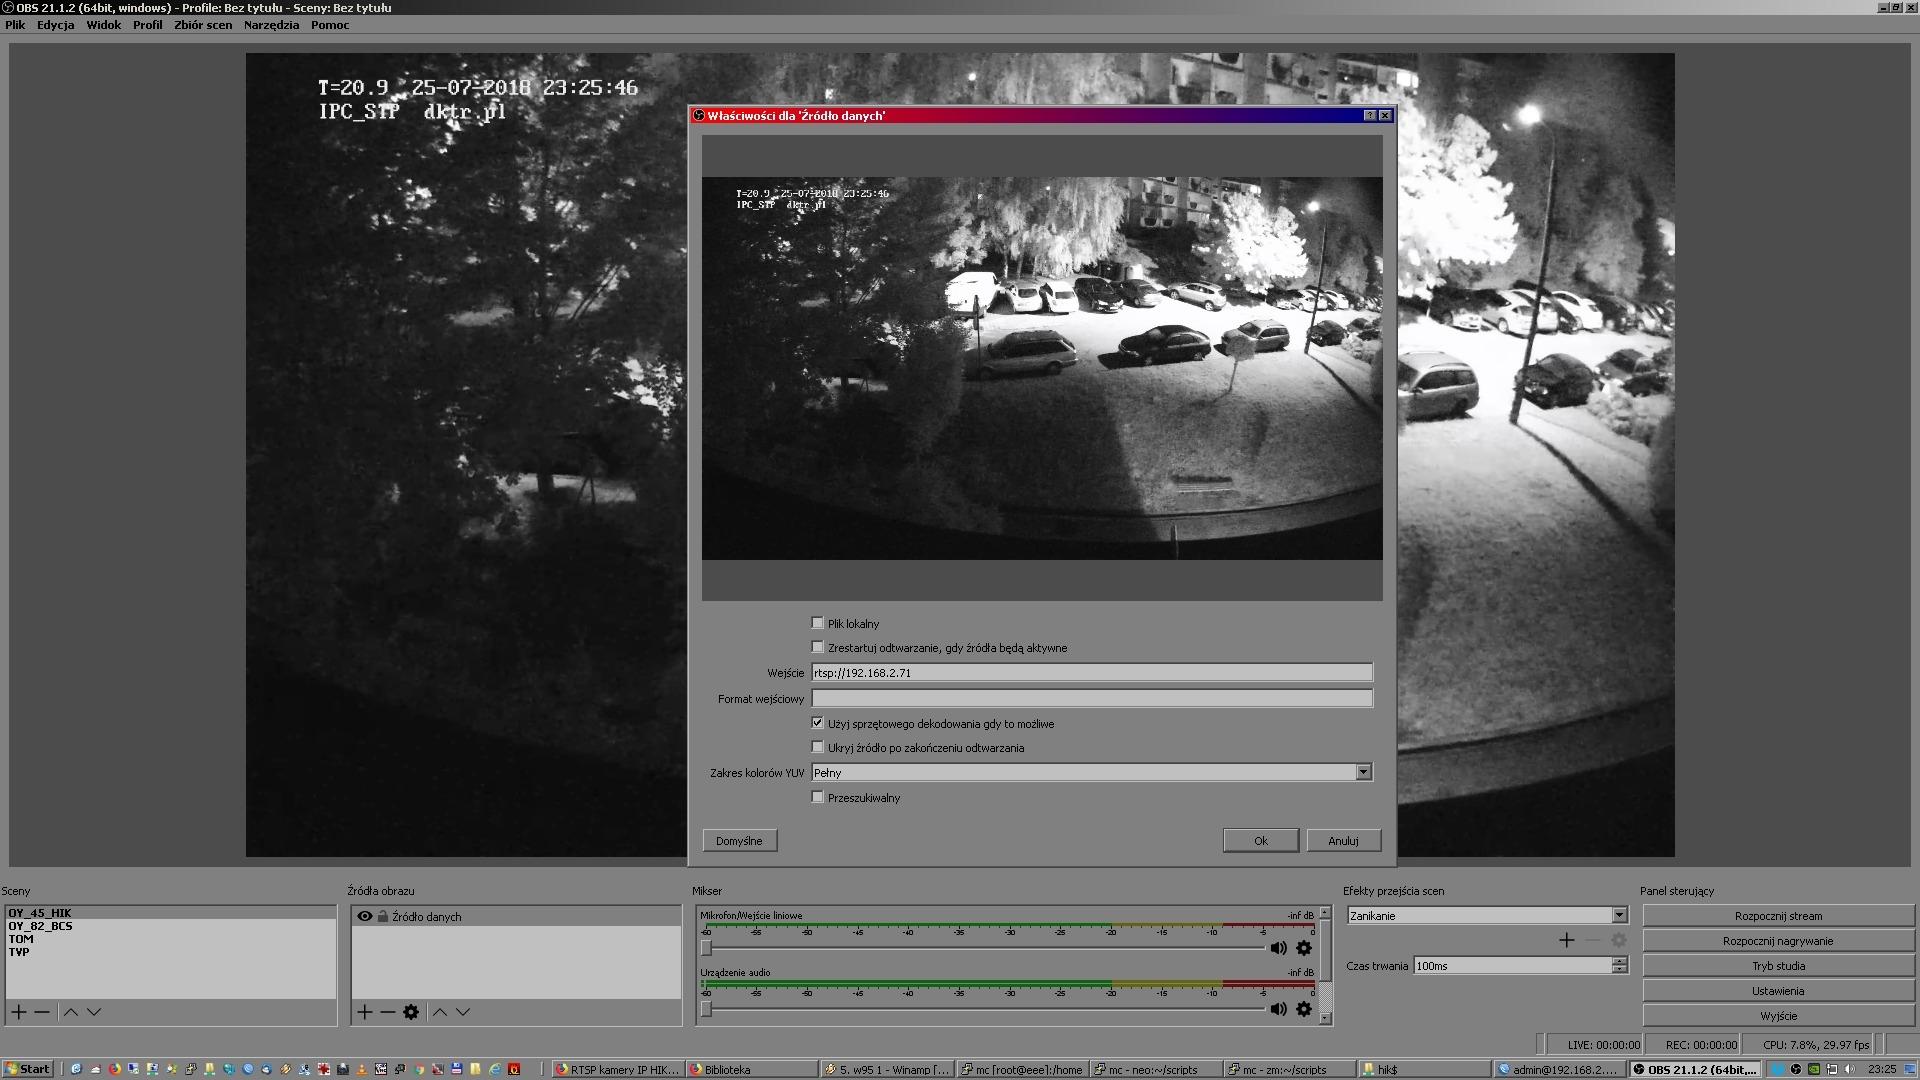 Rozwiązano] RTSP kamery IP HIK VISION  - elektroda pl